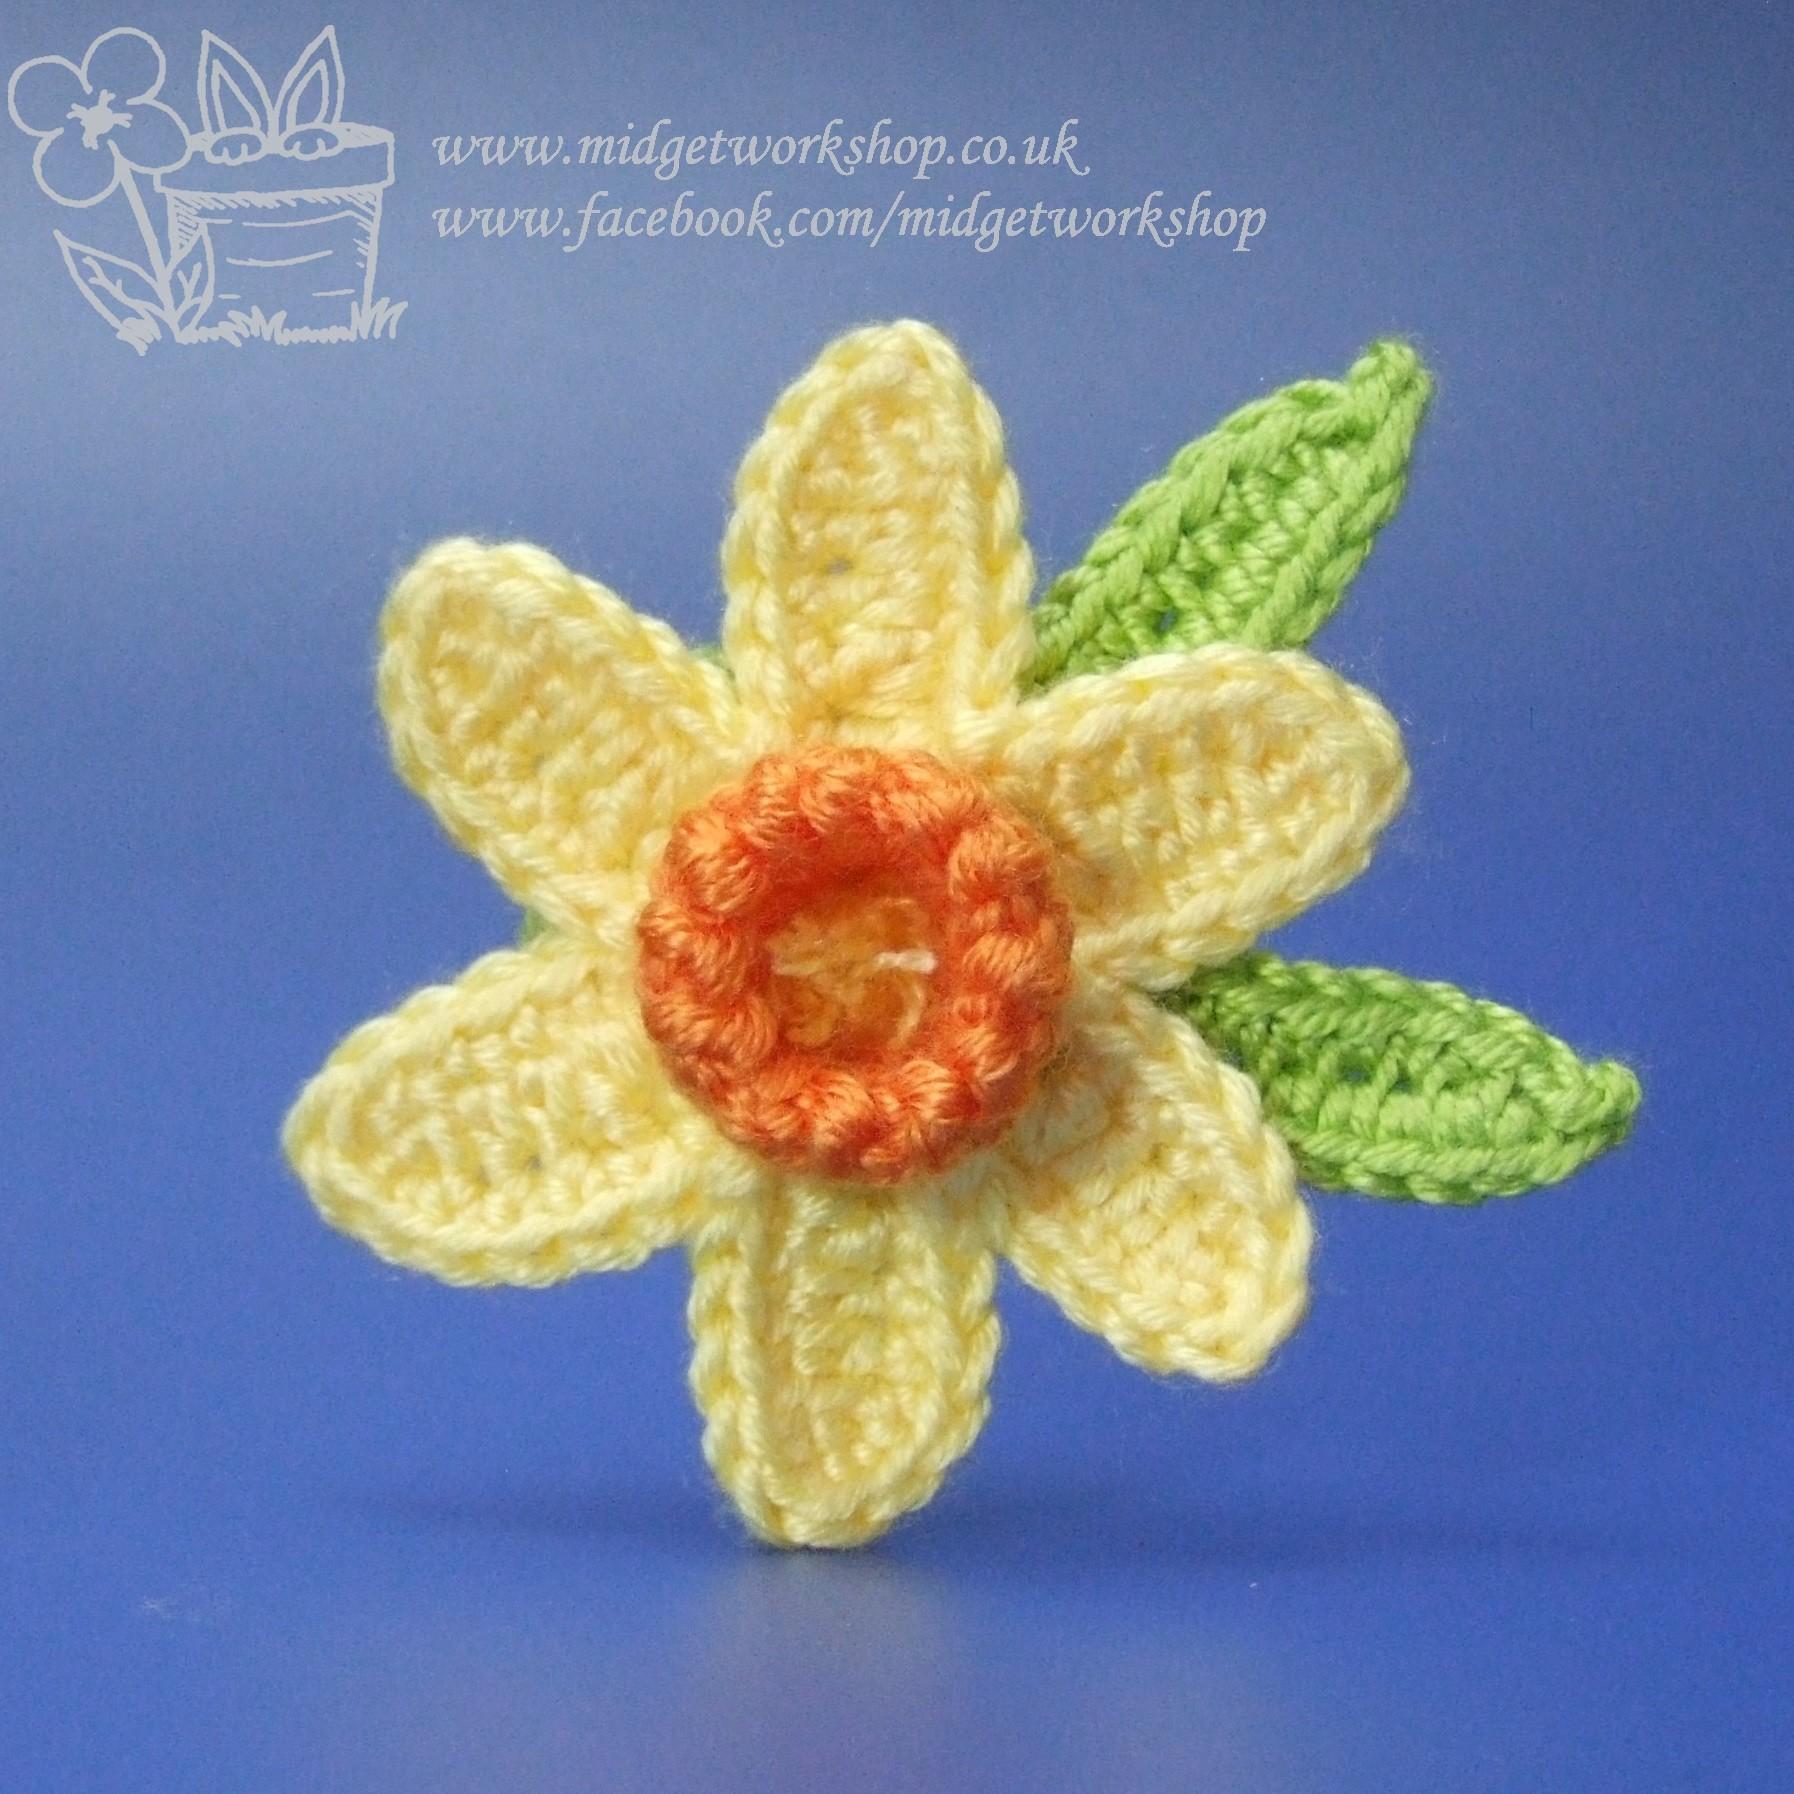 Daffodil Brooches The Midget Workshop